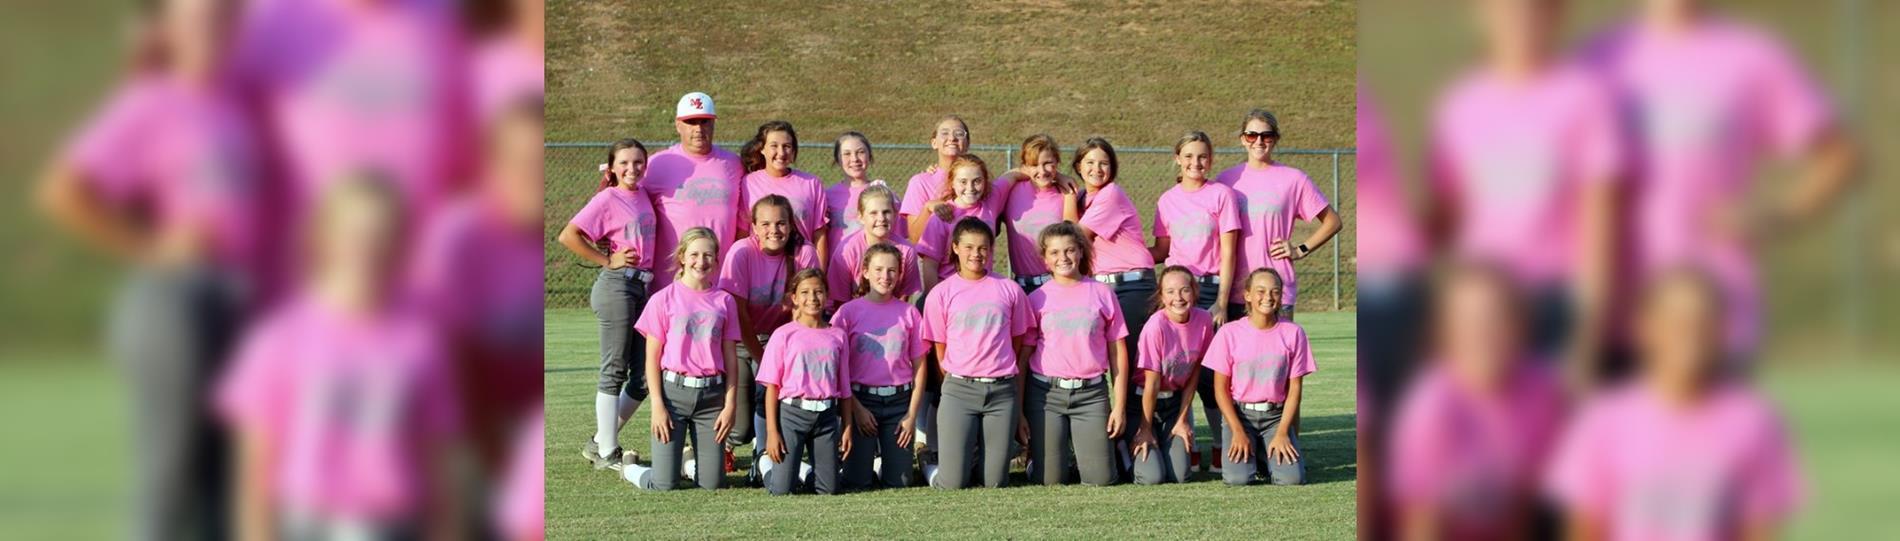 Softball Breast Cancer Game